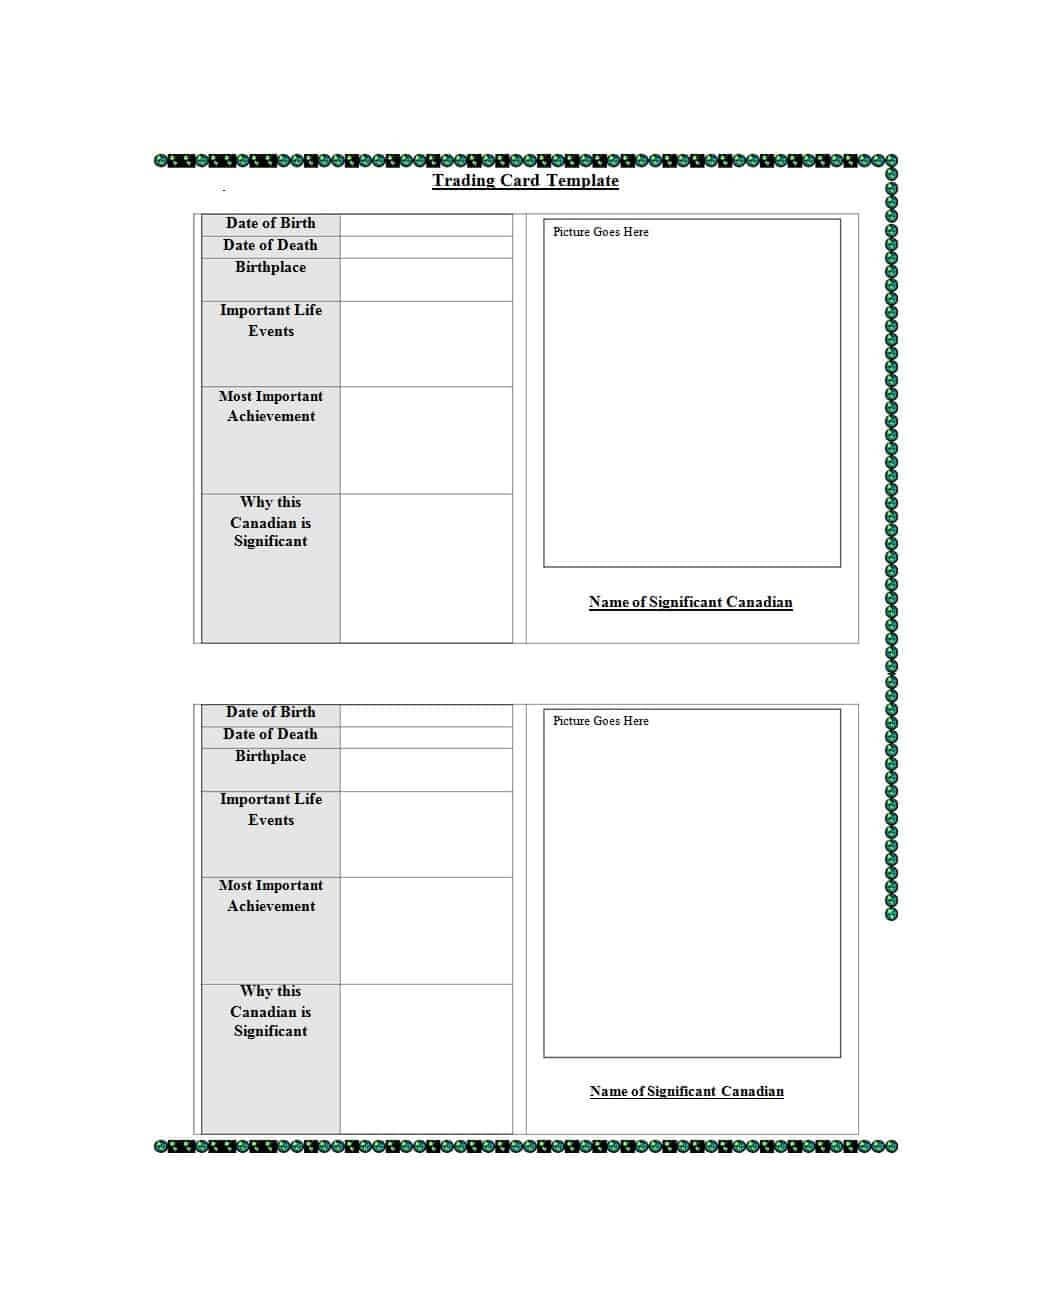 33 Free Trading Card Templates (Baseball, Football, Etc Intended For Free Trading Card Template Download